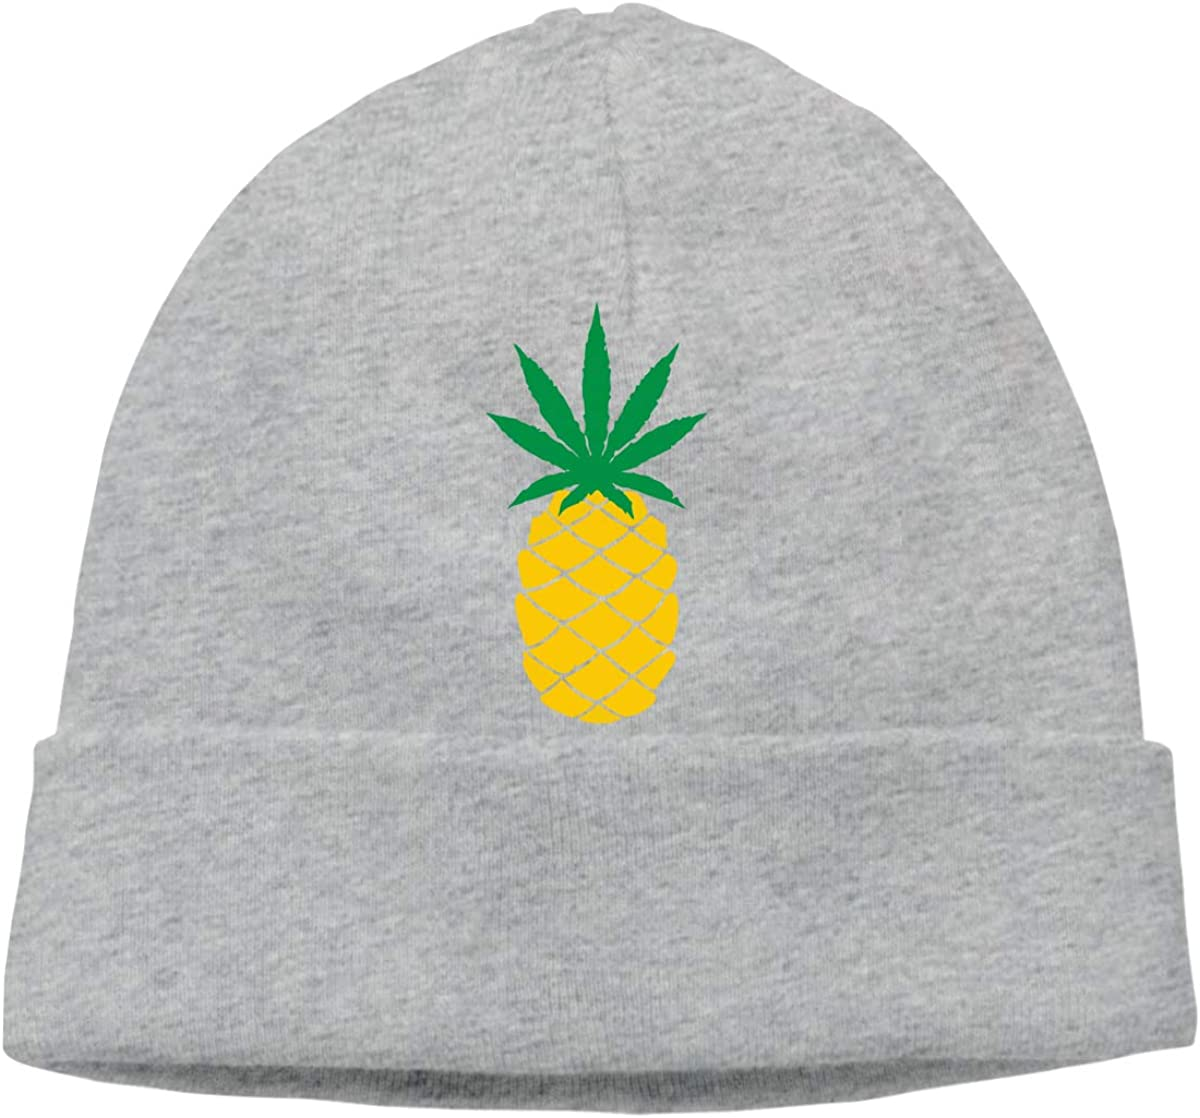 Helidoud Neon Palm Trees Winter Beanie Hat Knit Skull Cap for for Men /& Women